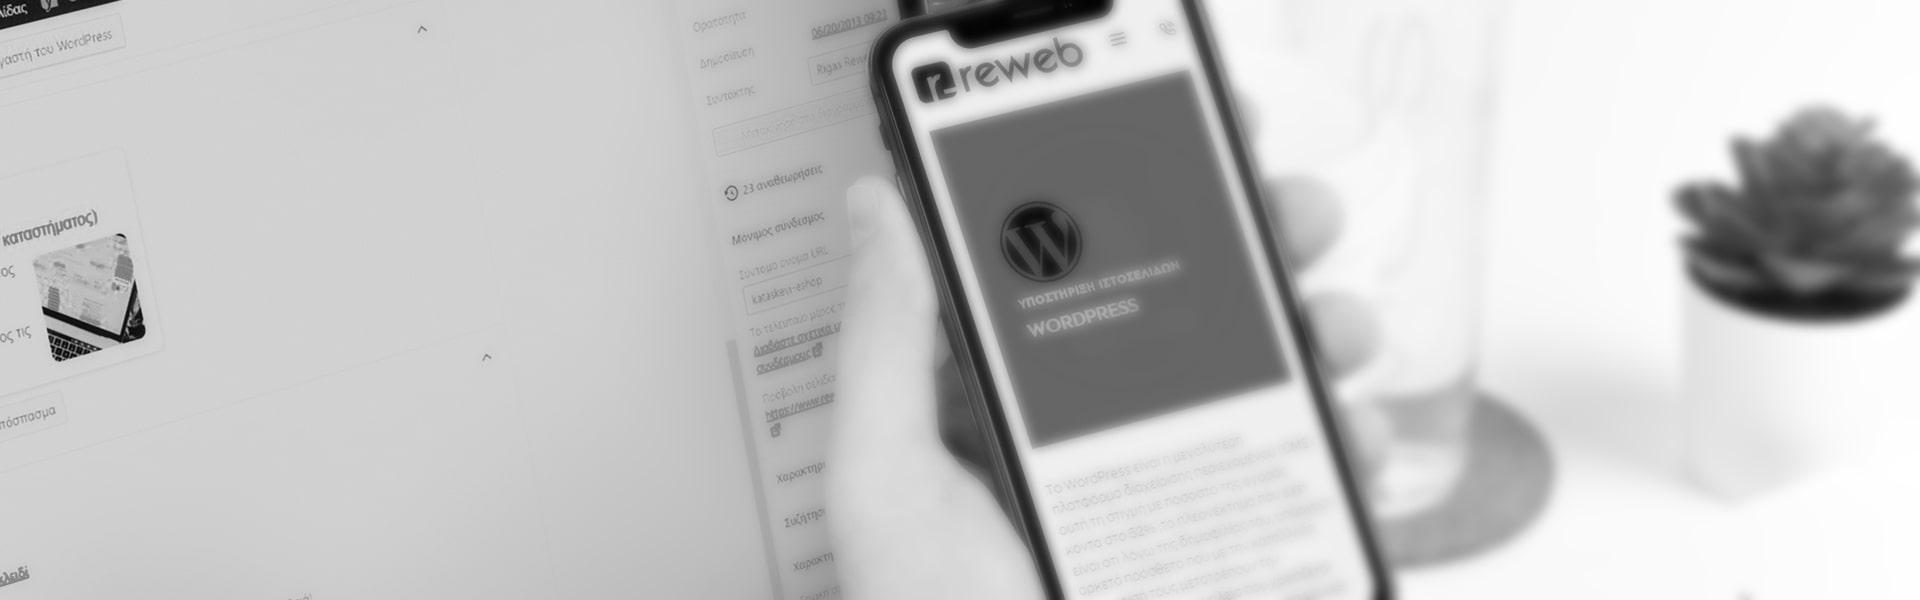 background υποστήριξή wordpress